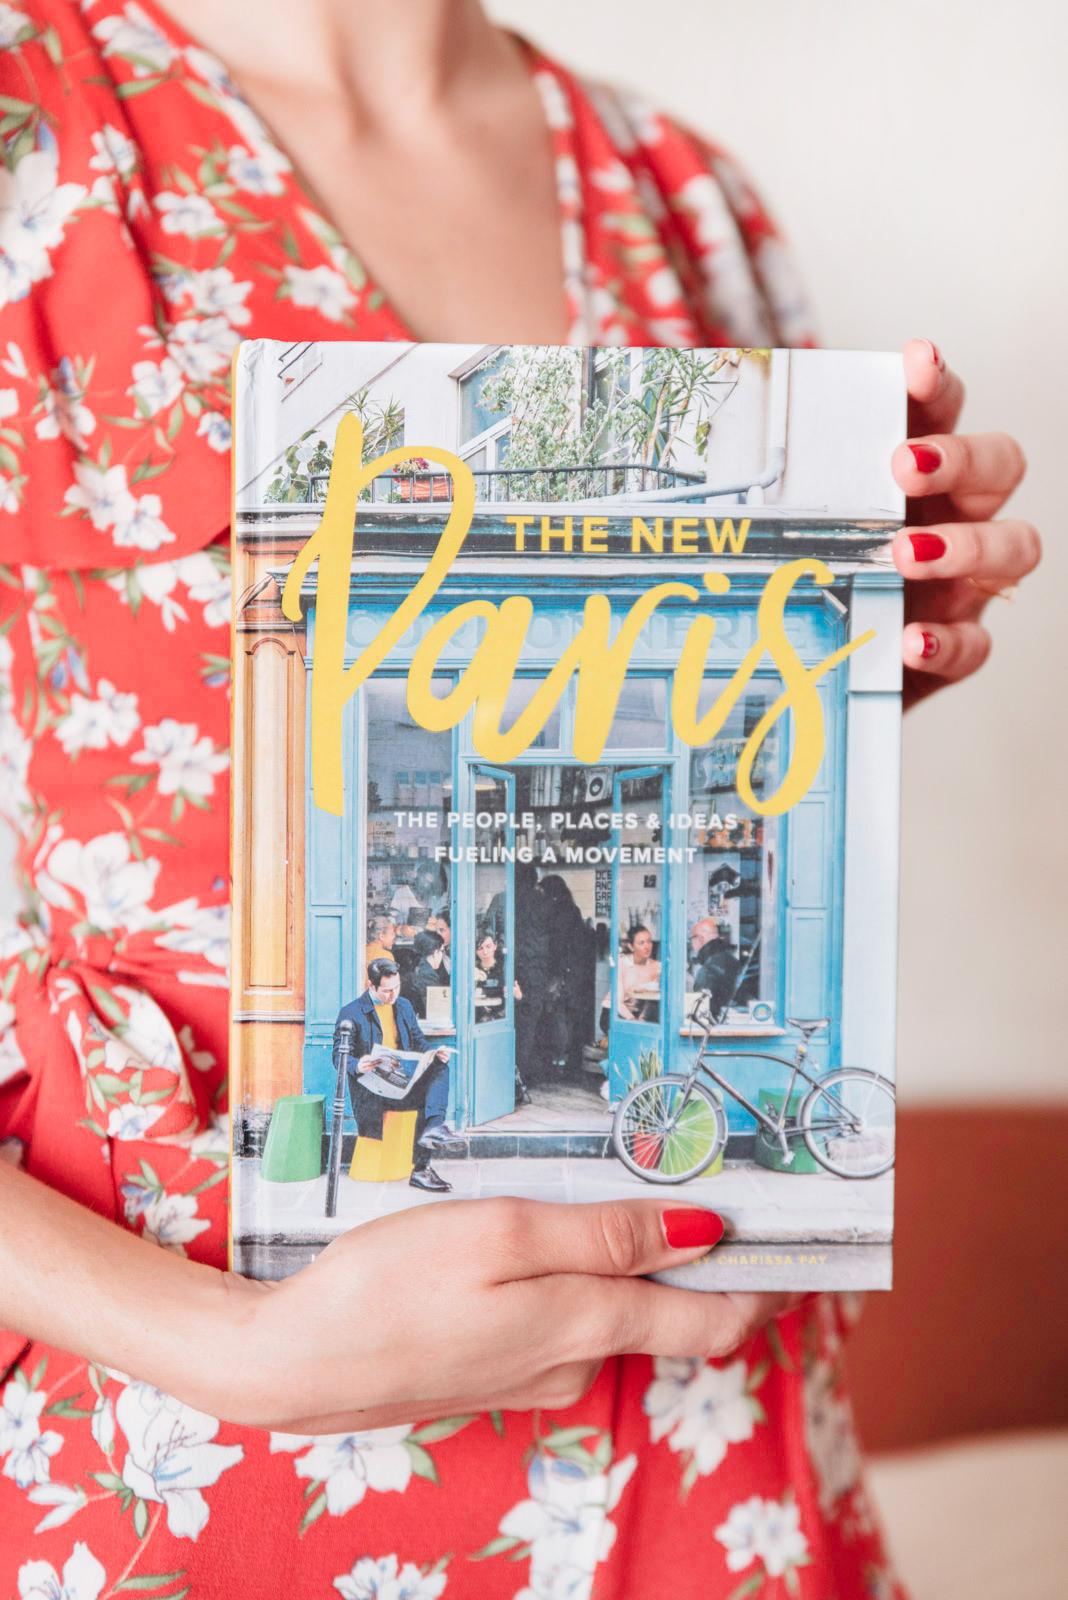 Blog-Mode-And-The-City-Lifestyle-Cinq-Petites-Choses-229-the-new-paris-book